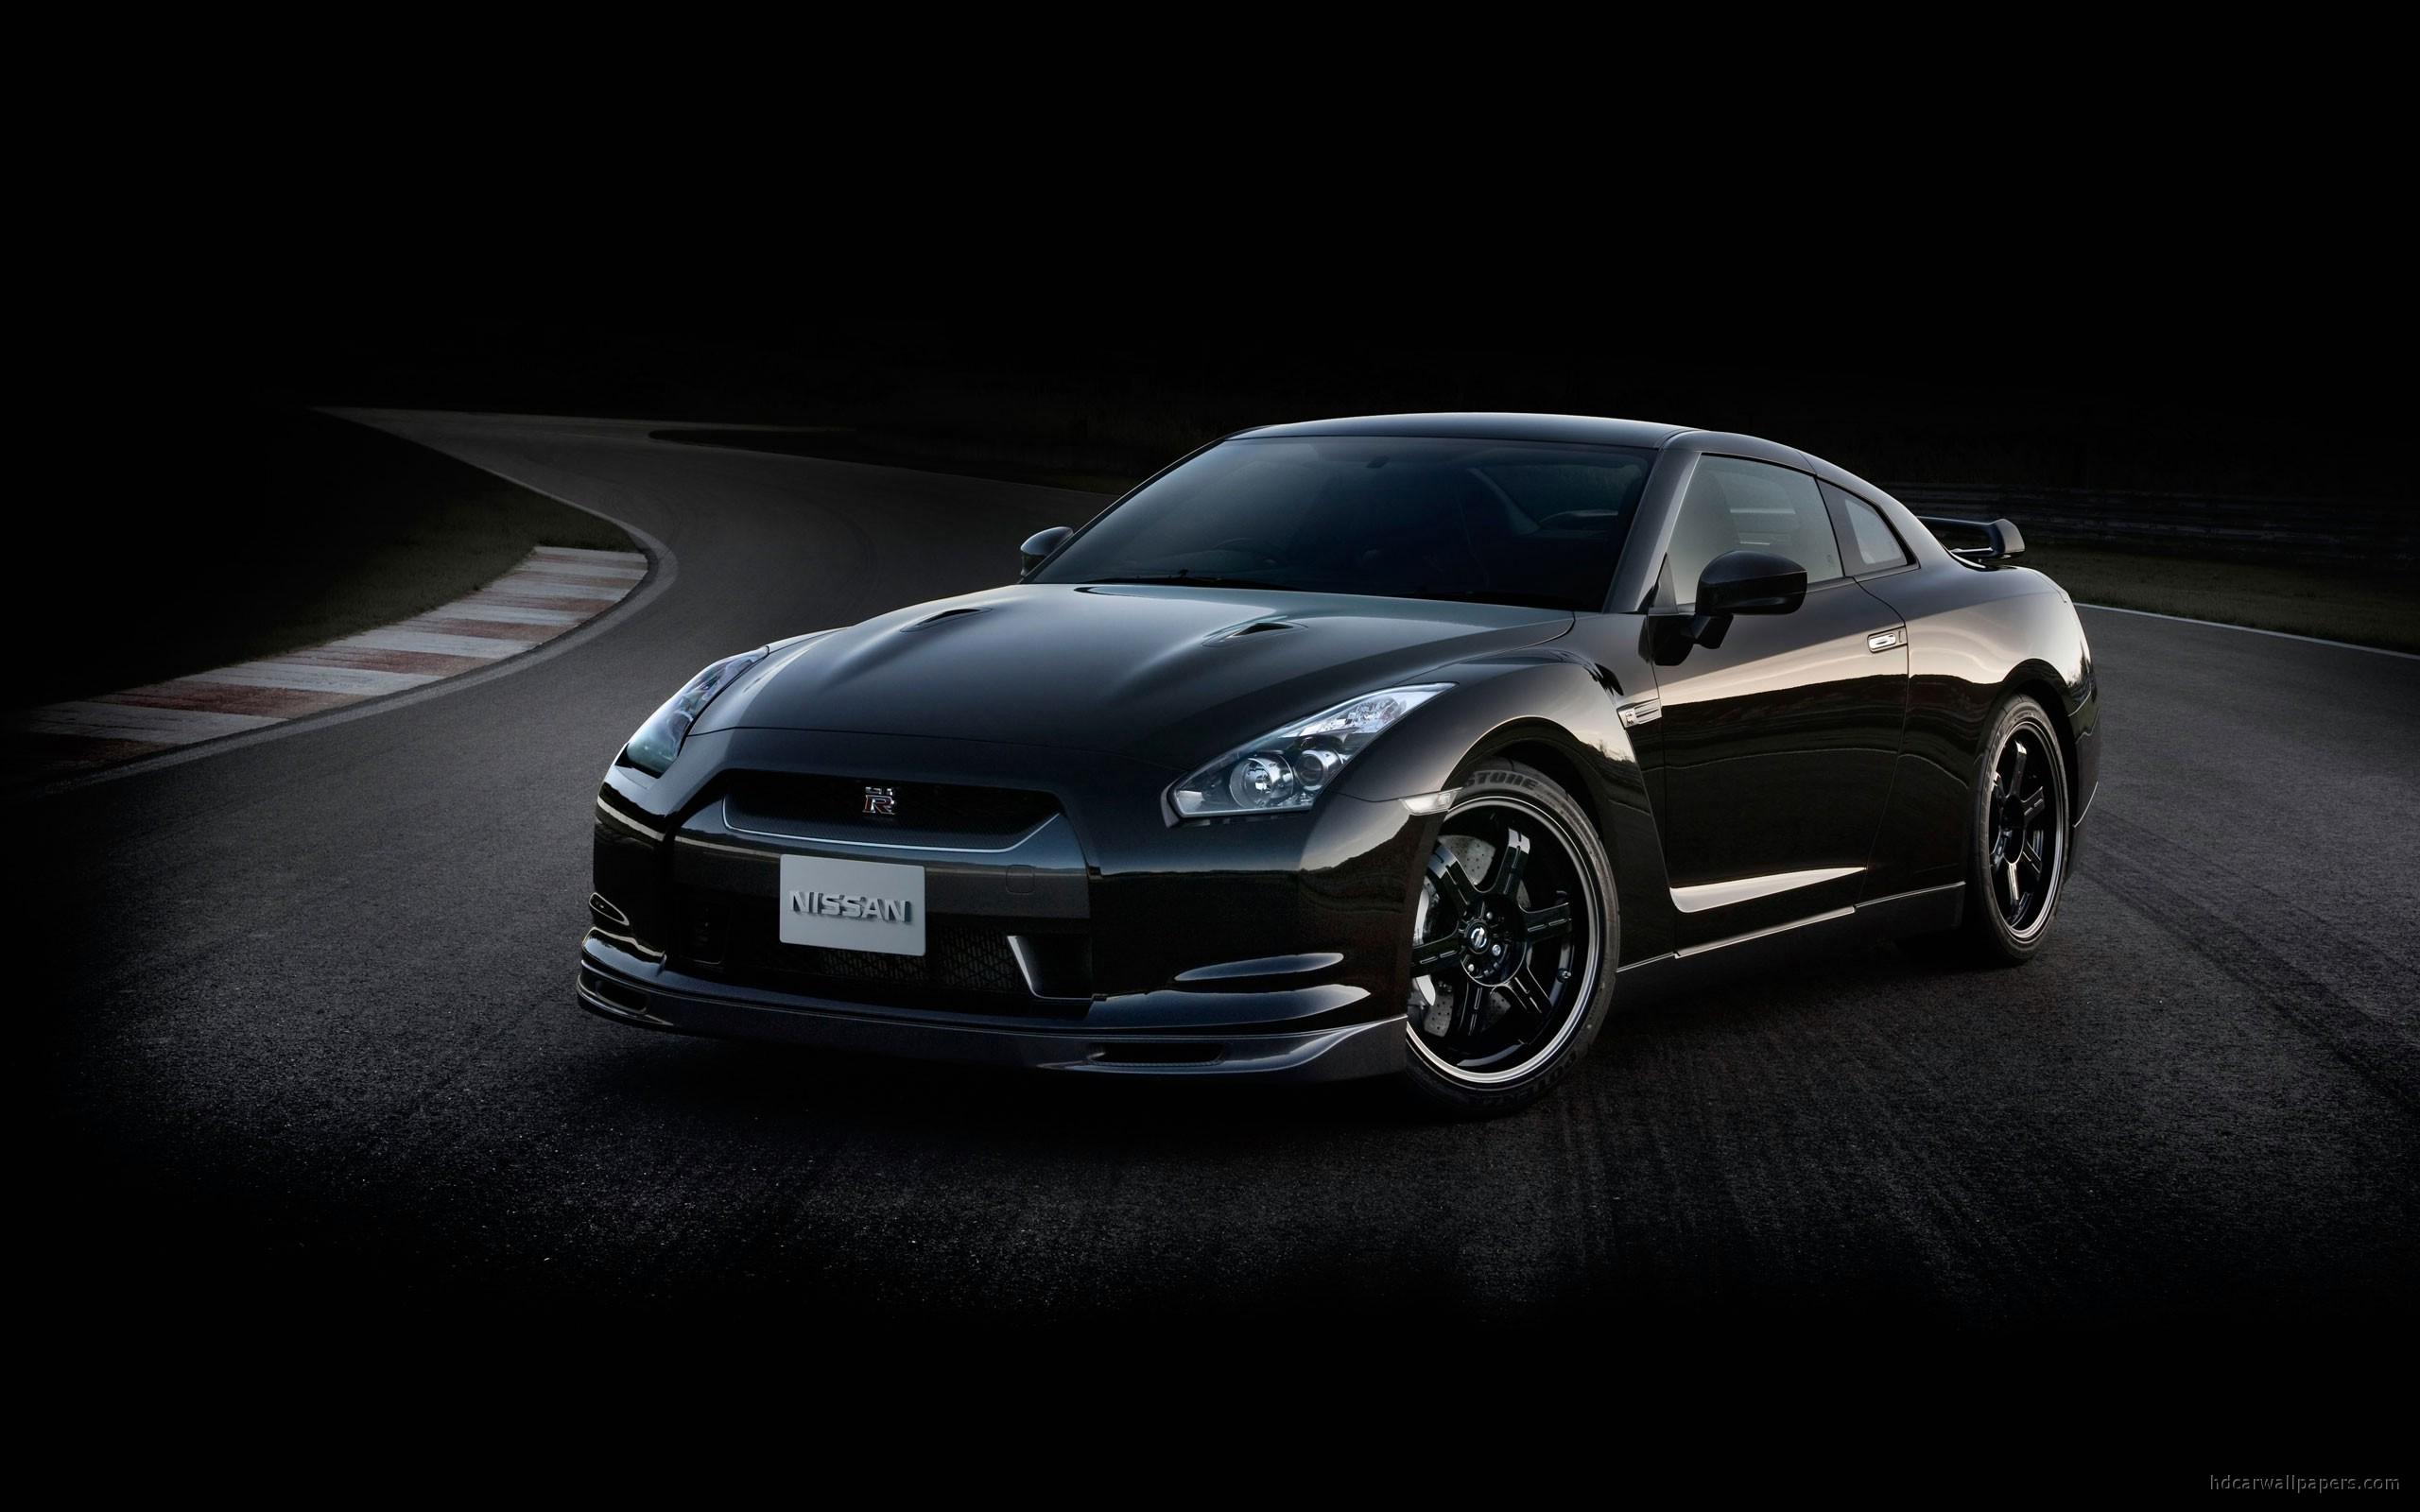 Nissan GT R SpecV Wallpaper | HD Car Wallpapers | ID #1331